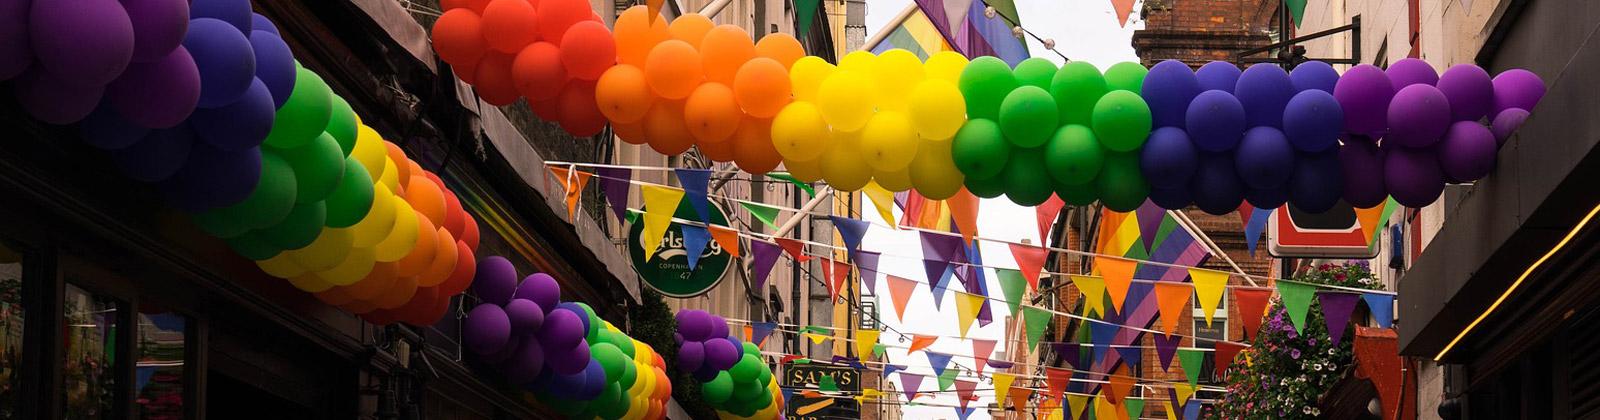 weltweiser · Handbuch Fernweh · Schüleraustausch · Homosexualität